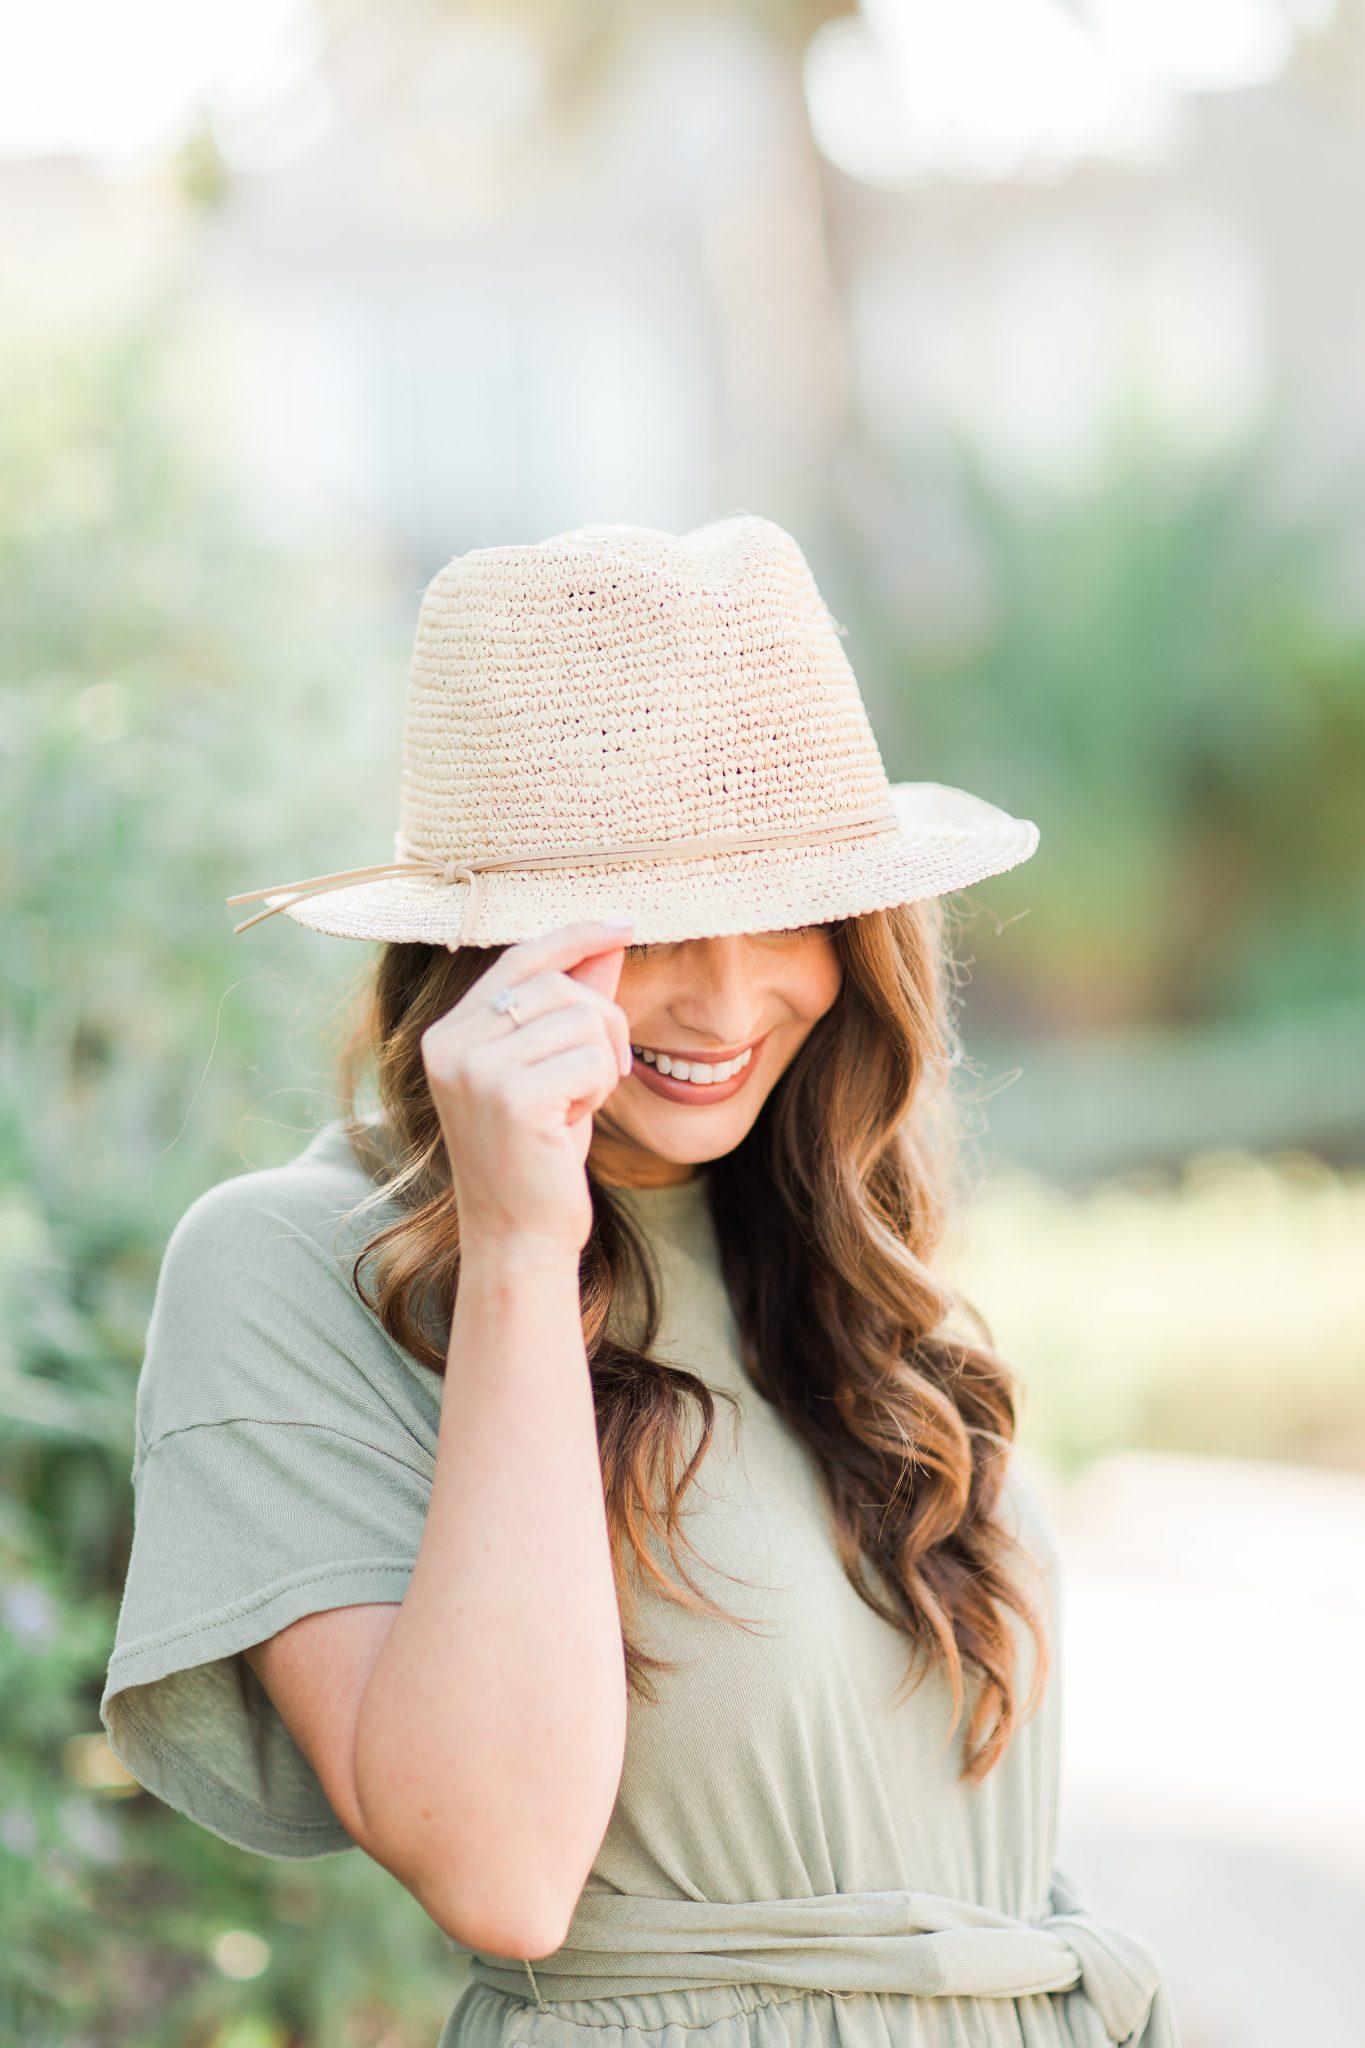 Maxie Elle | Panama straw hat